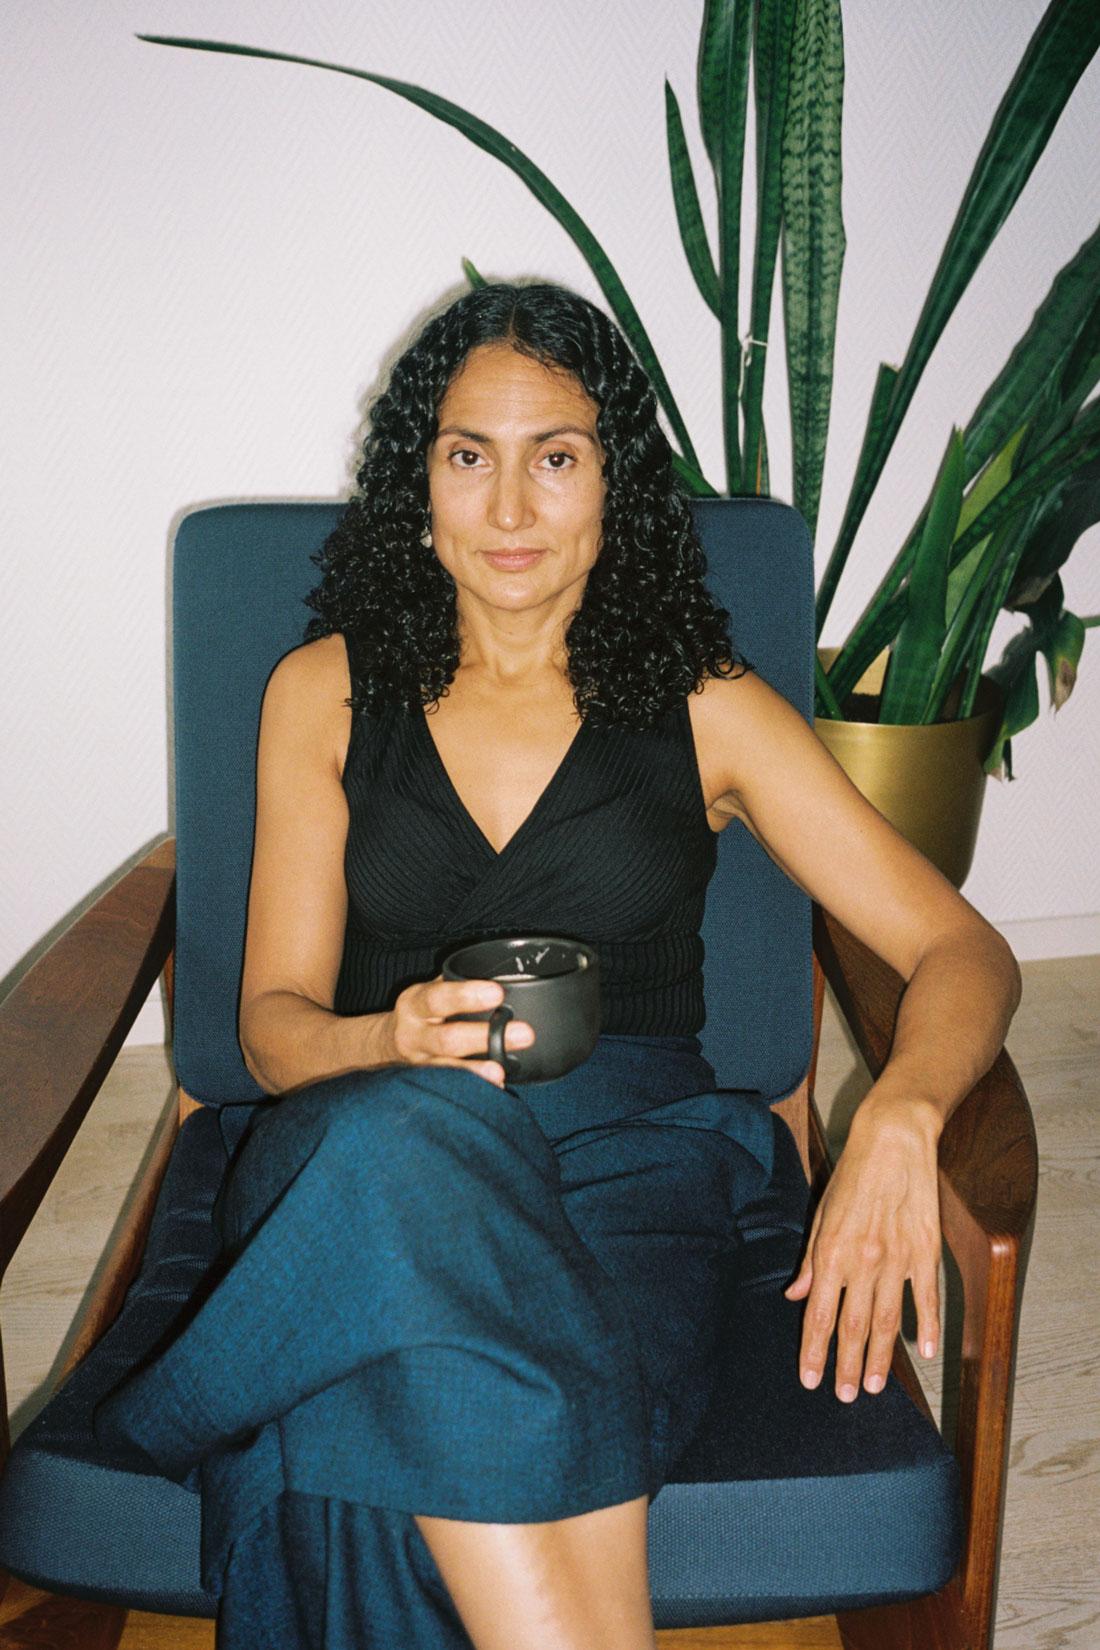 Kunstner Yamile Calderon hjemme i stua